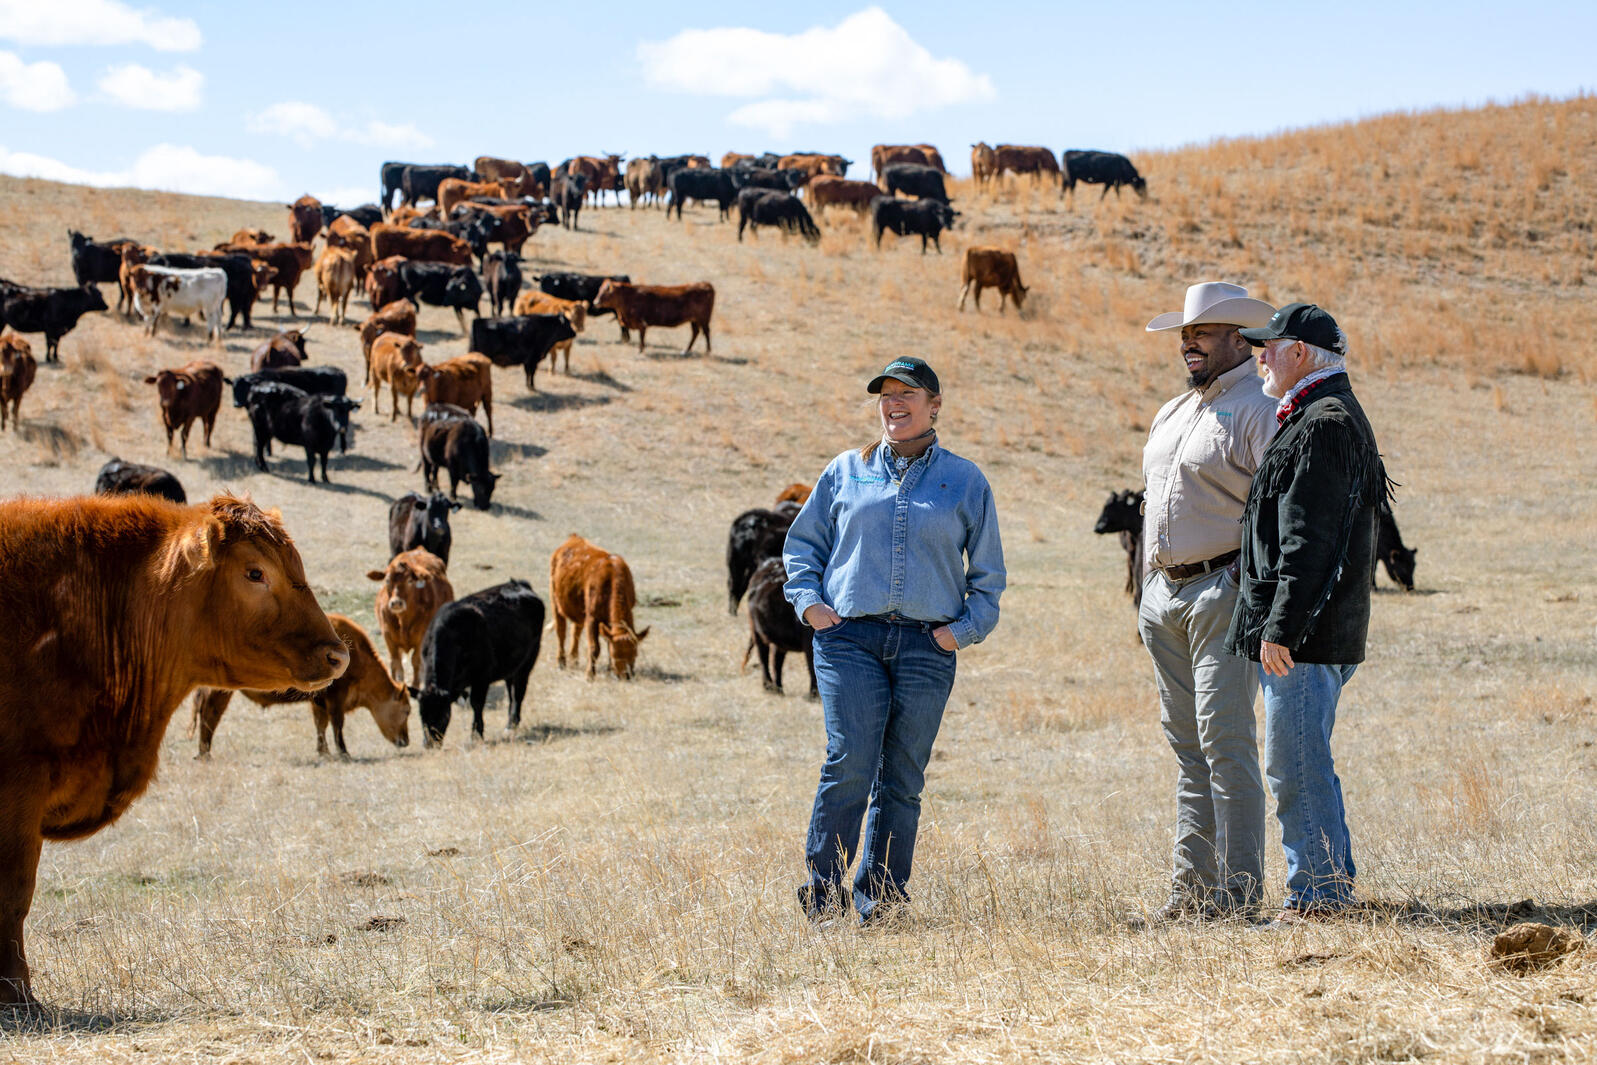 Marshall Johnson, center, and Kay Cornelius meet with Panorama rancher Dave Hutchinson on his Nebraska ranch. Wyatt DeVries